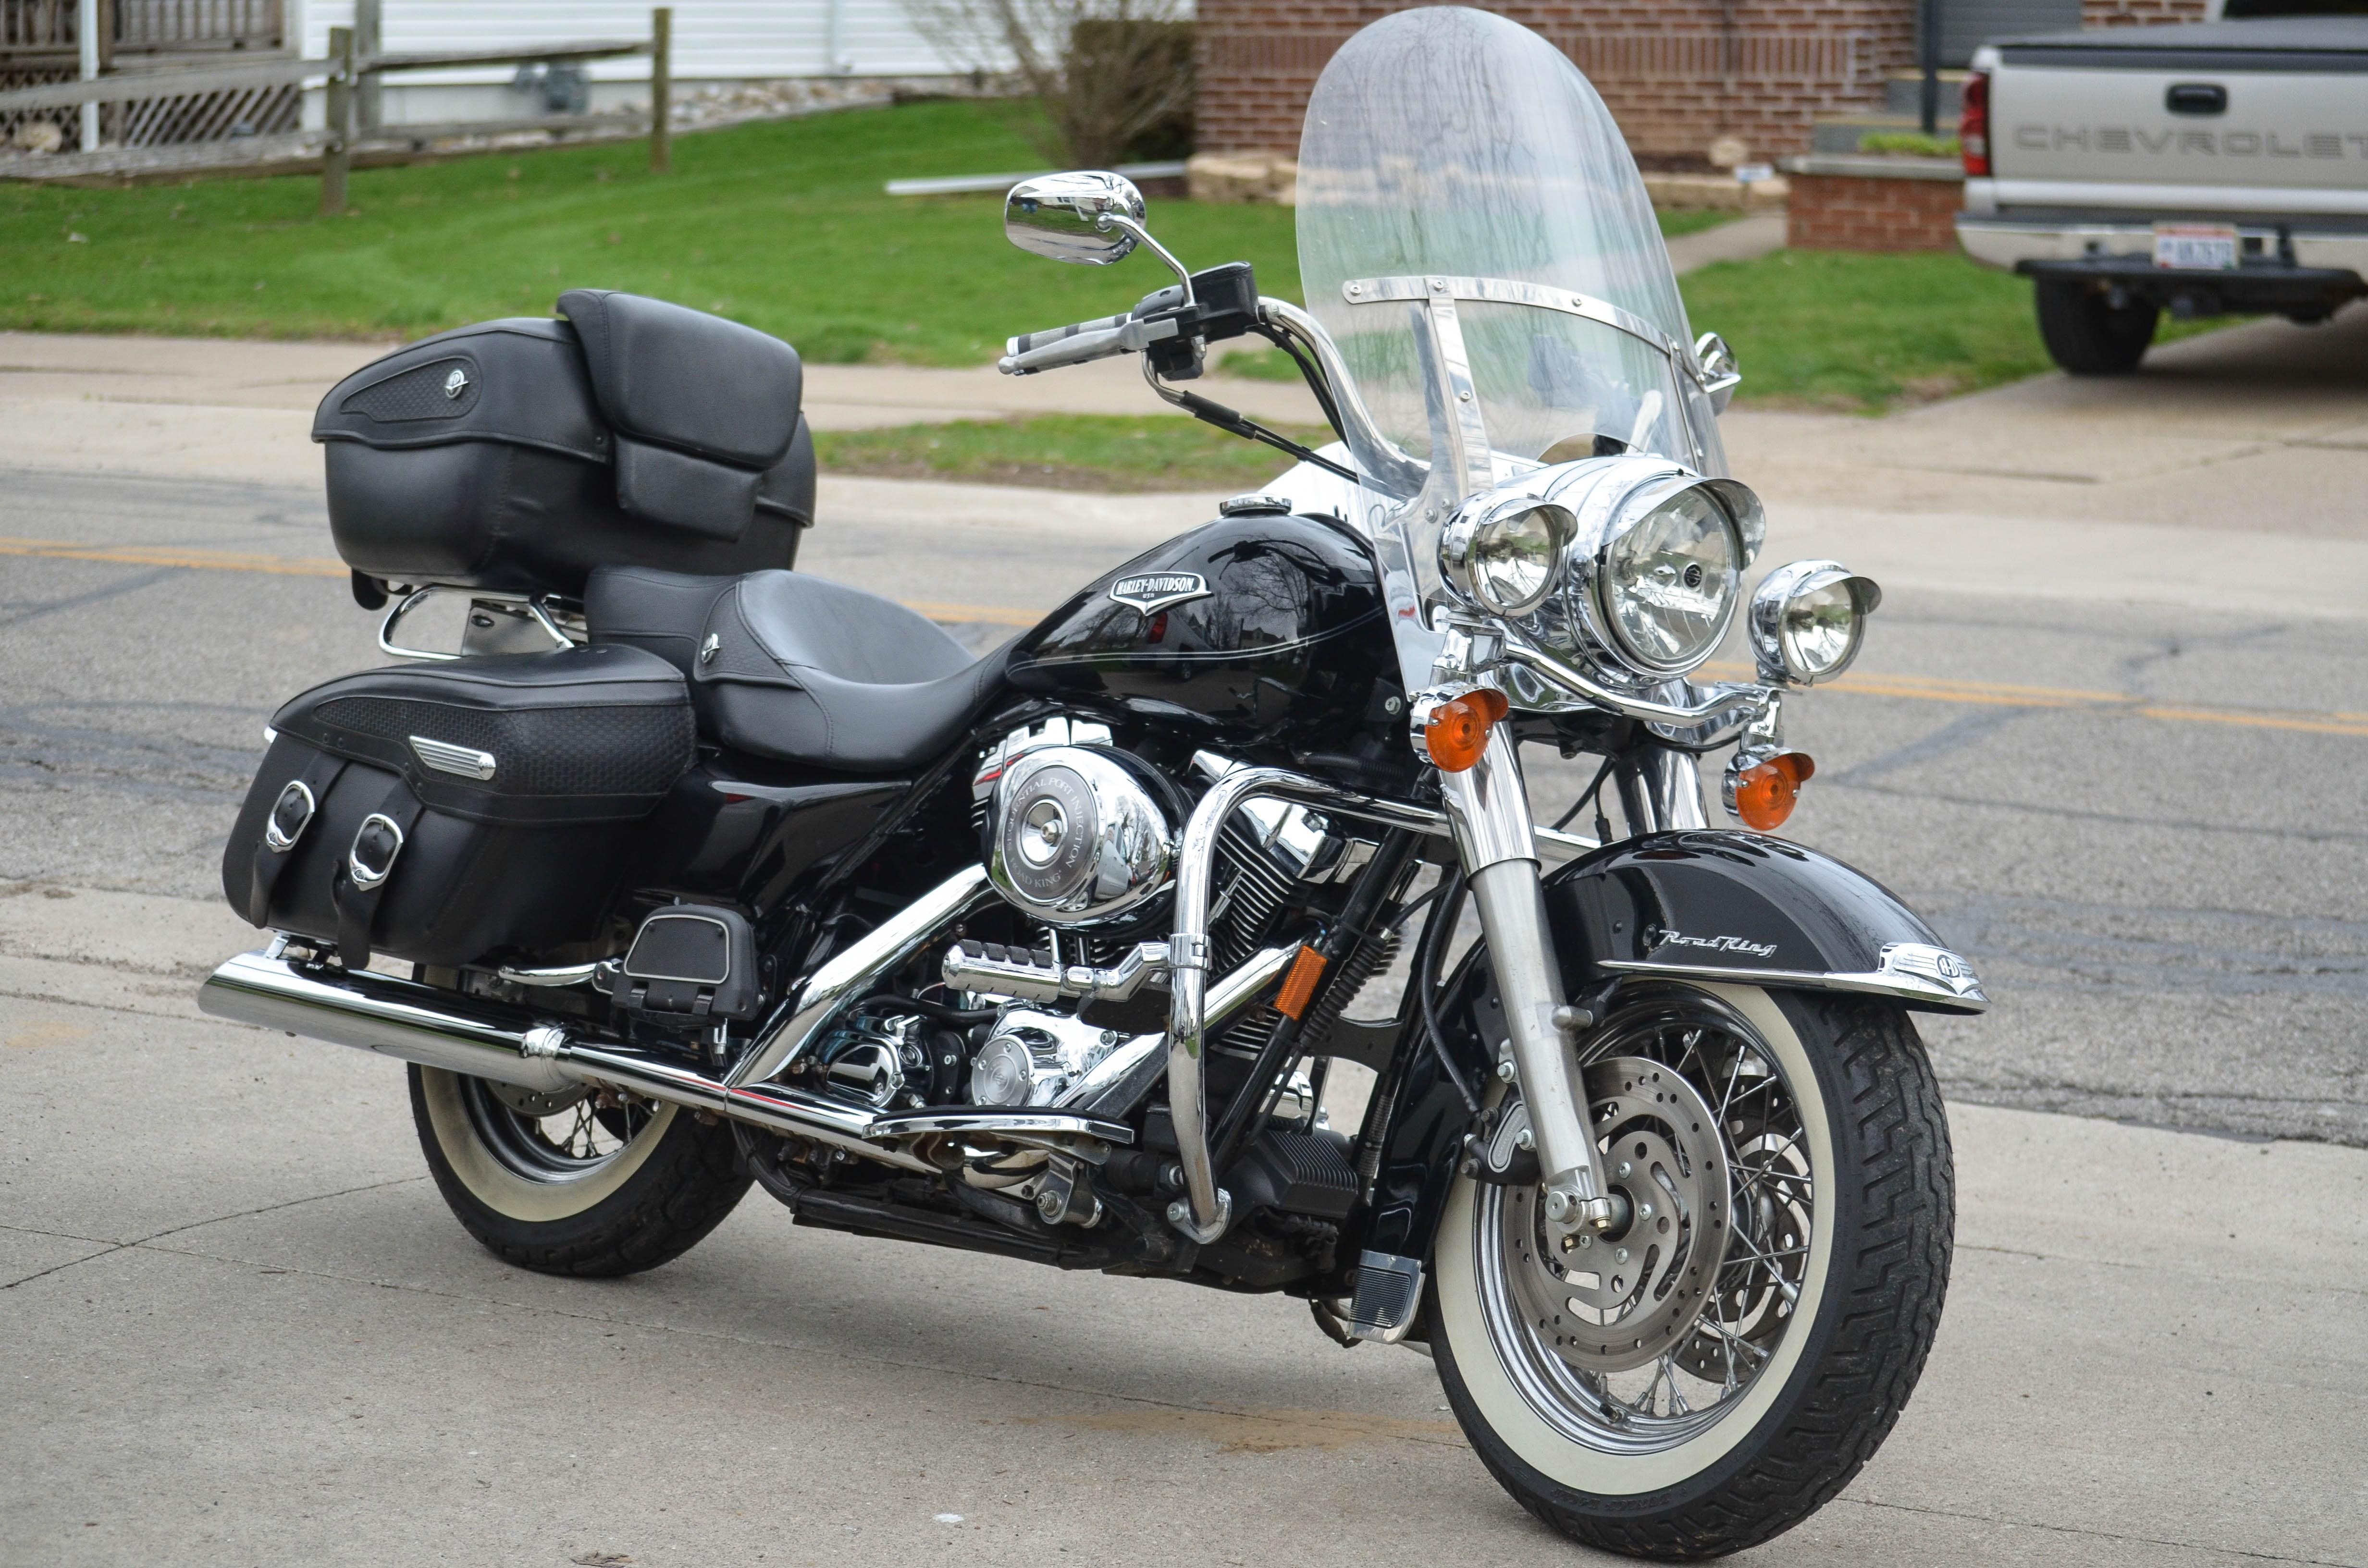 Harley Davidson Touring Motorcycles For Sale Dallas Tx >> 2005 Harley-Davidson® FLHRCI Road King® Classic (Black), Napoleon, Ohio (709480) | ChopperExchange